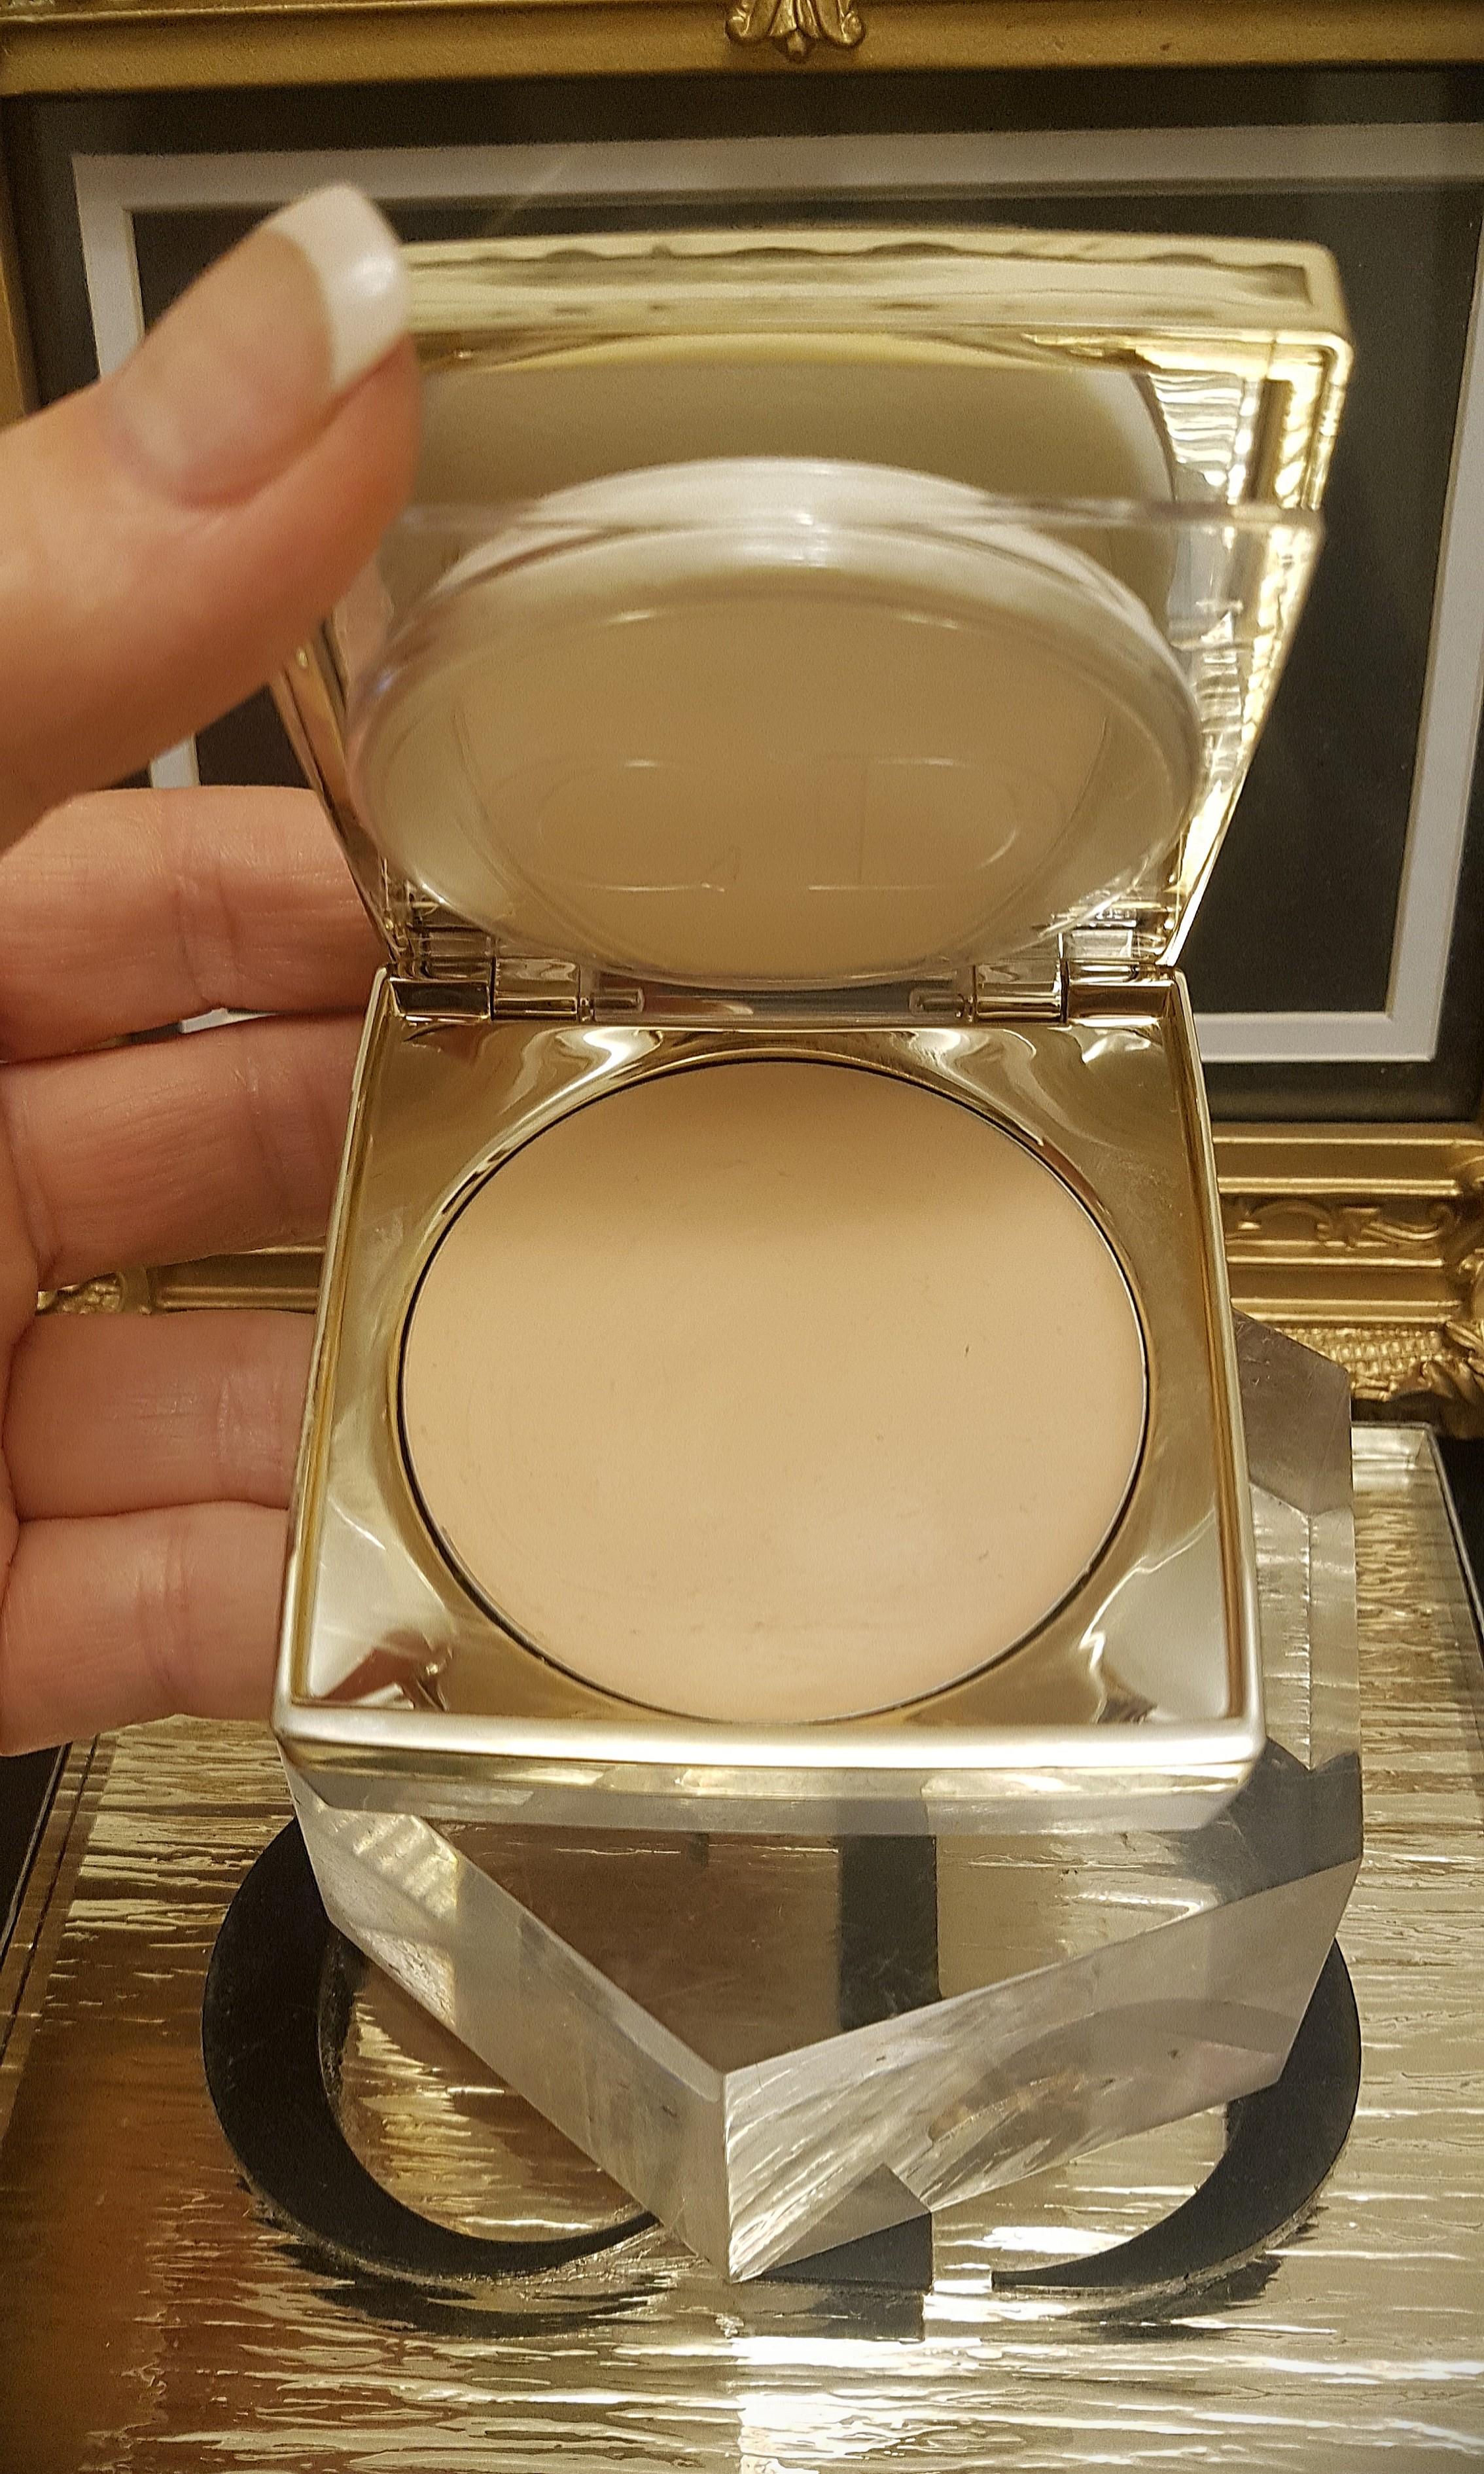 Dior Prestige White collection Blemish balm spf30